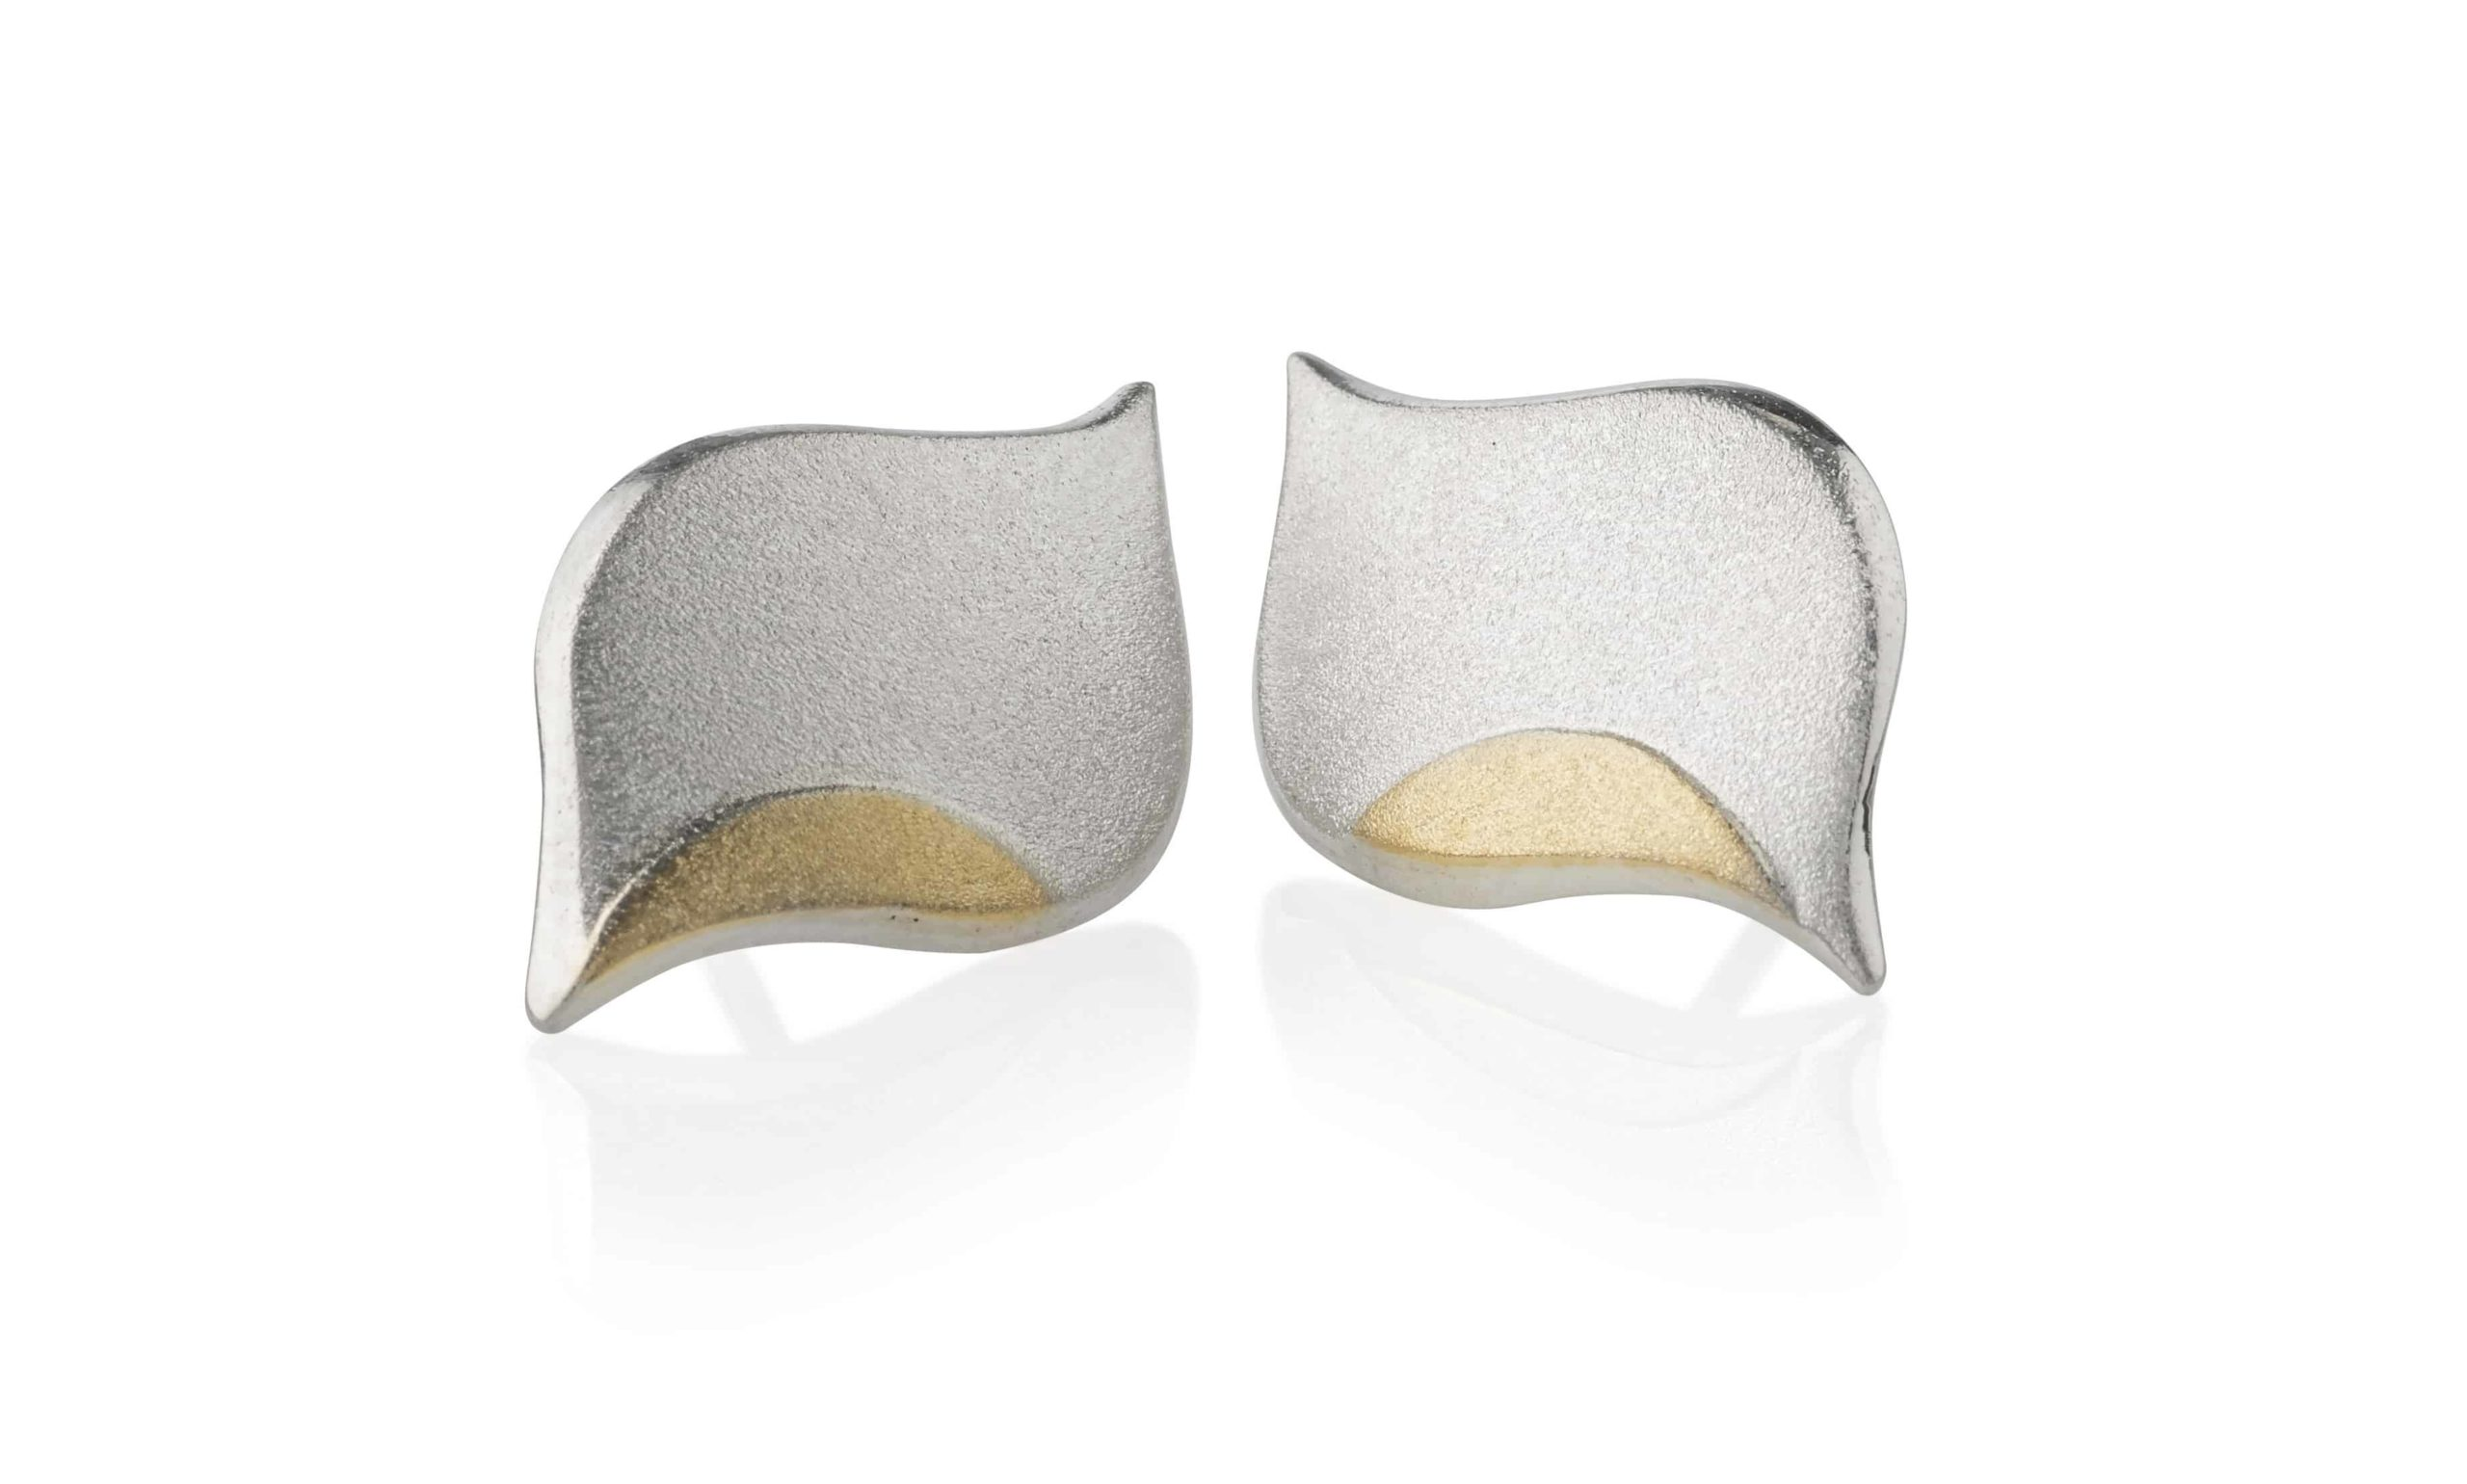 Product Gold Dance Earstuds Jewellery